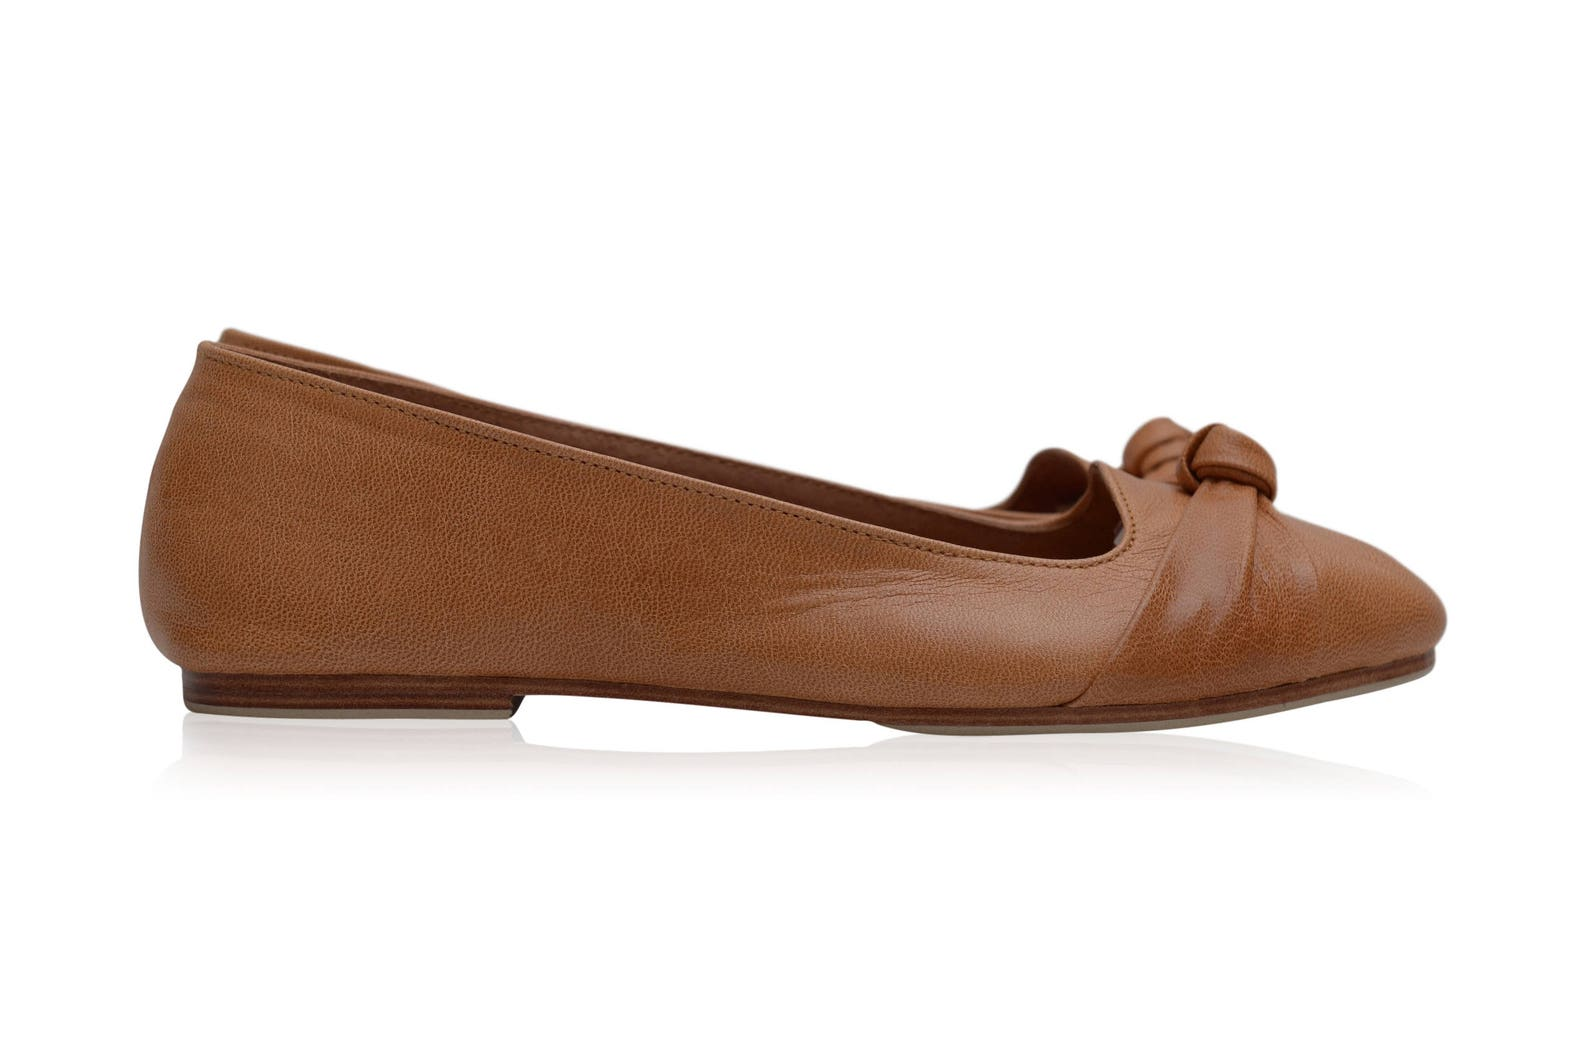 panama. leather ballet flats / women shoes / leather flats / women flats / womens shoes. sizes 35-43. available in different lea